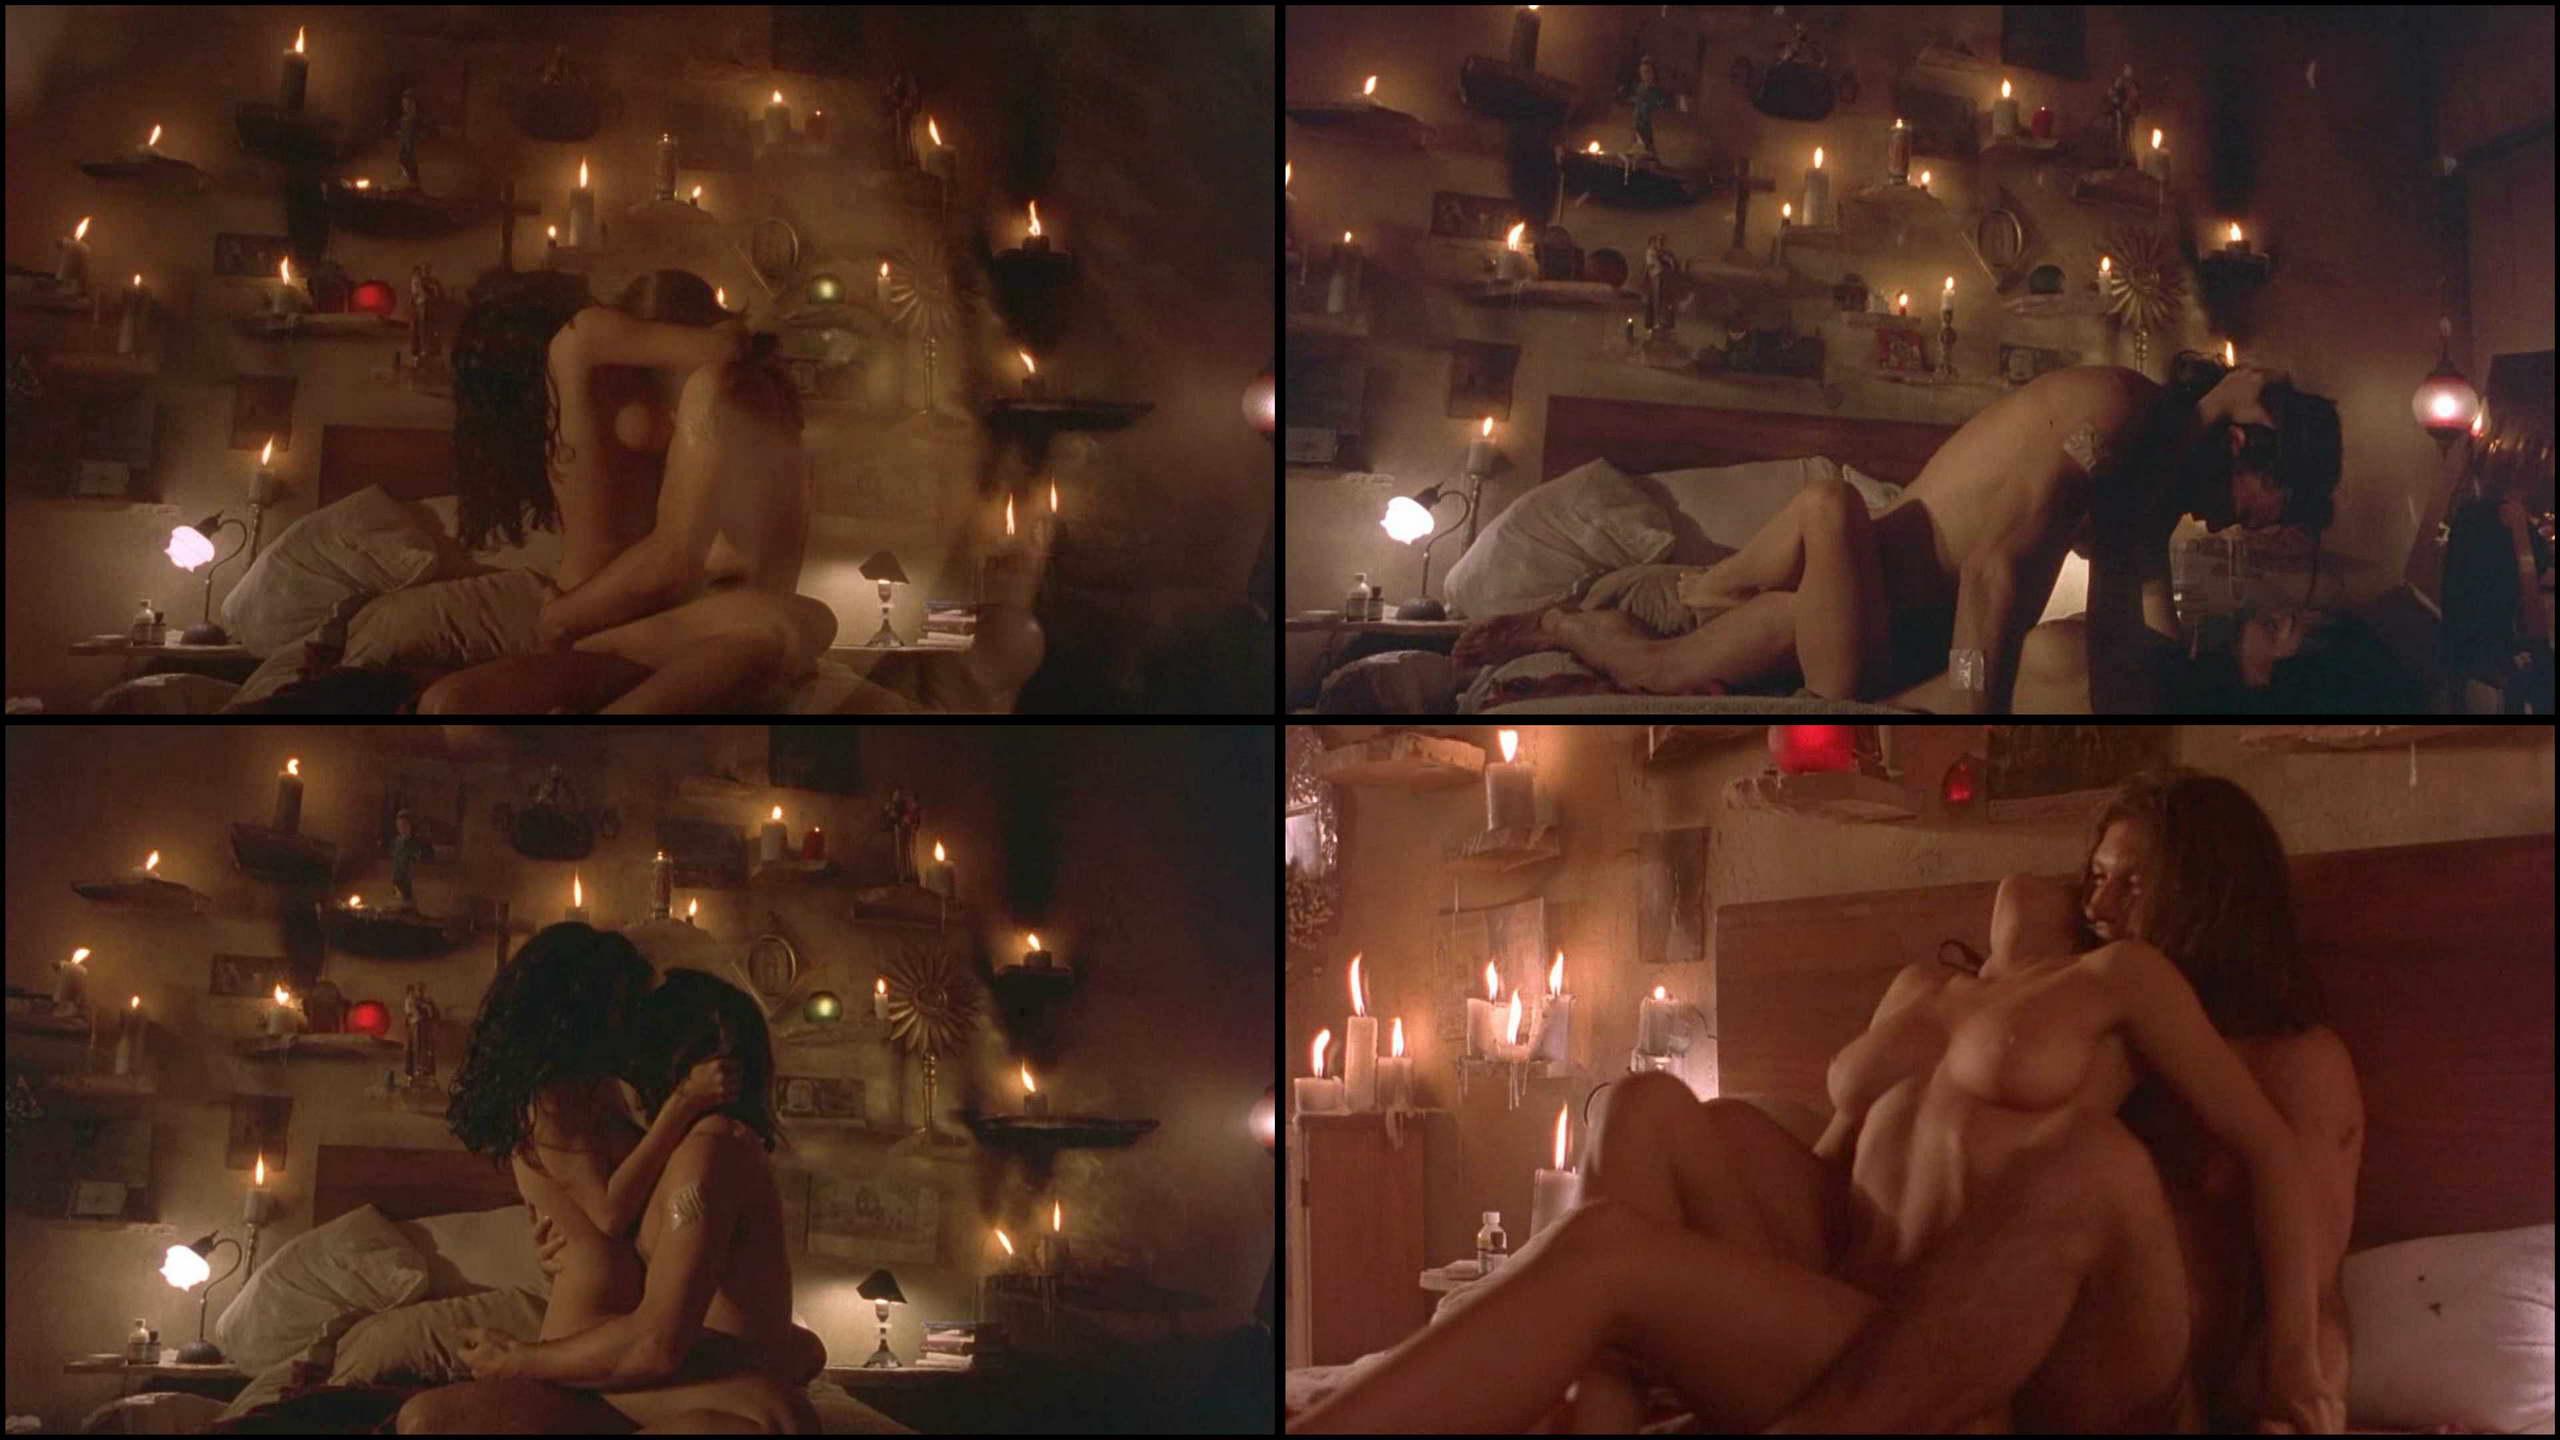 seks-stseni-iz-filmov-s-gollivudskimi-zvezdami-russkie-porno-i-aktrisi